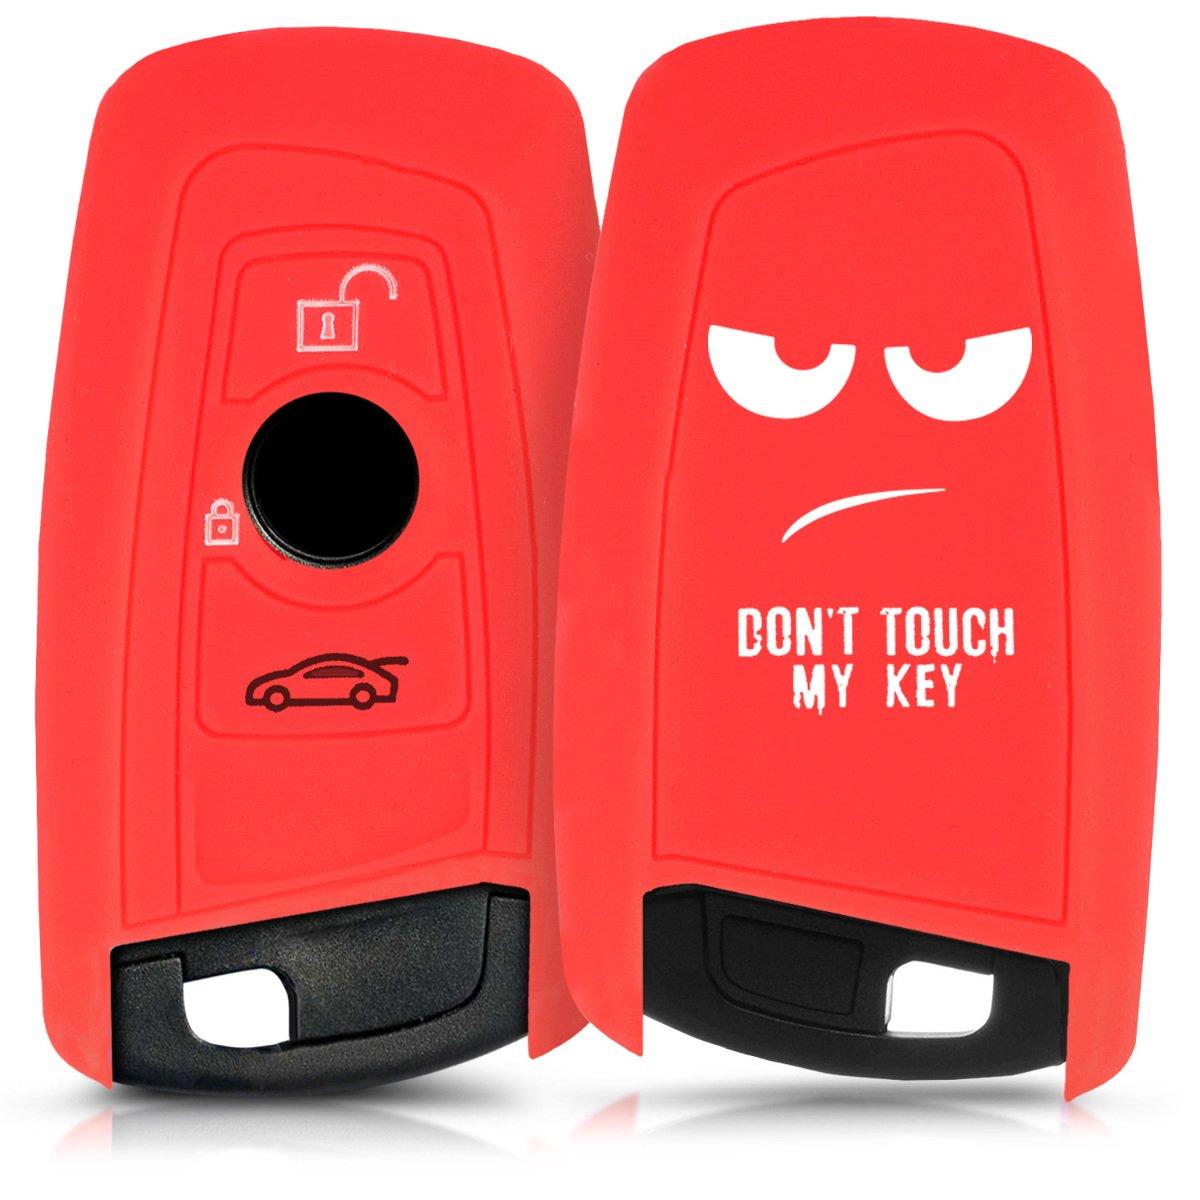 - Carcasa Protectora Solamente Keyless Go - Case Mando de Auto Gris//Negro Silicona kwmobile Funda de Silicona para Llave con Control Remoto de 3 Botones para Coche BMW de Suave